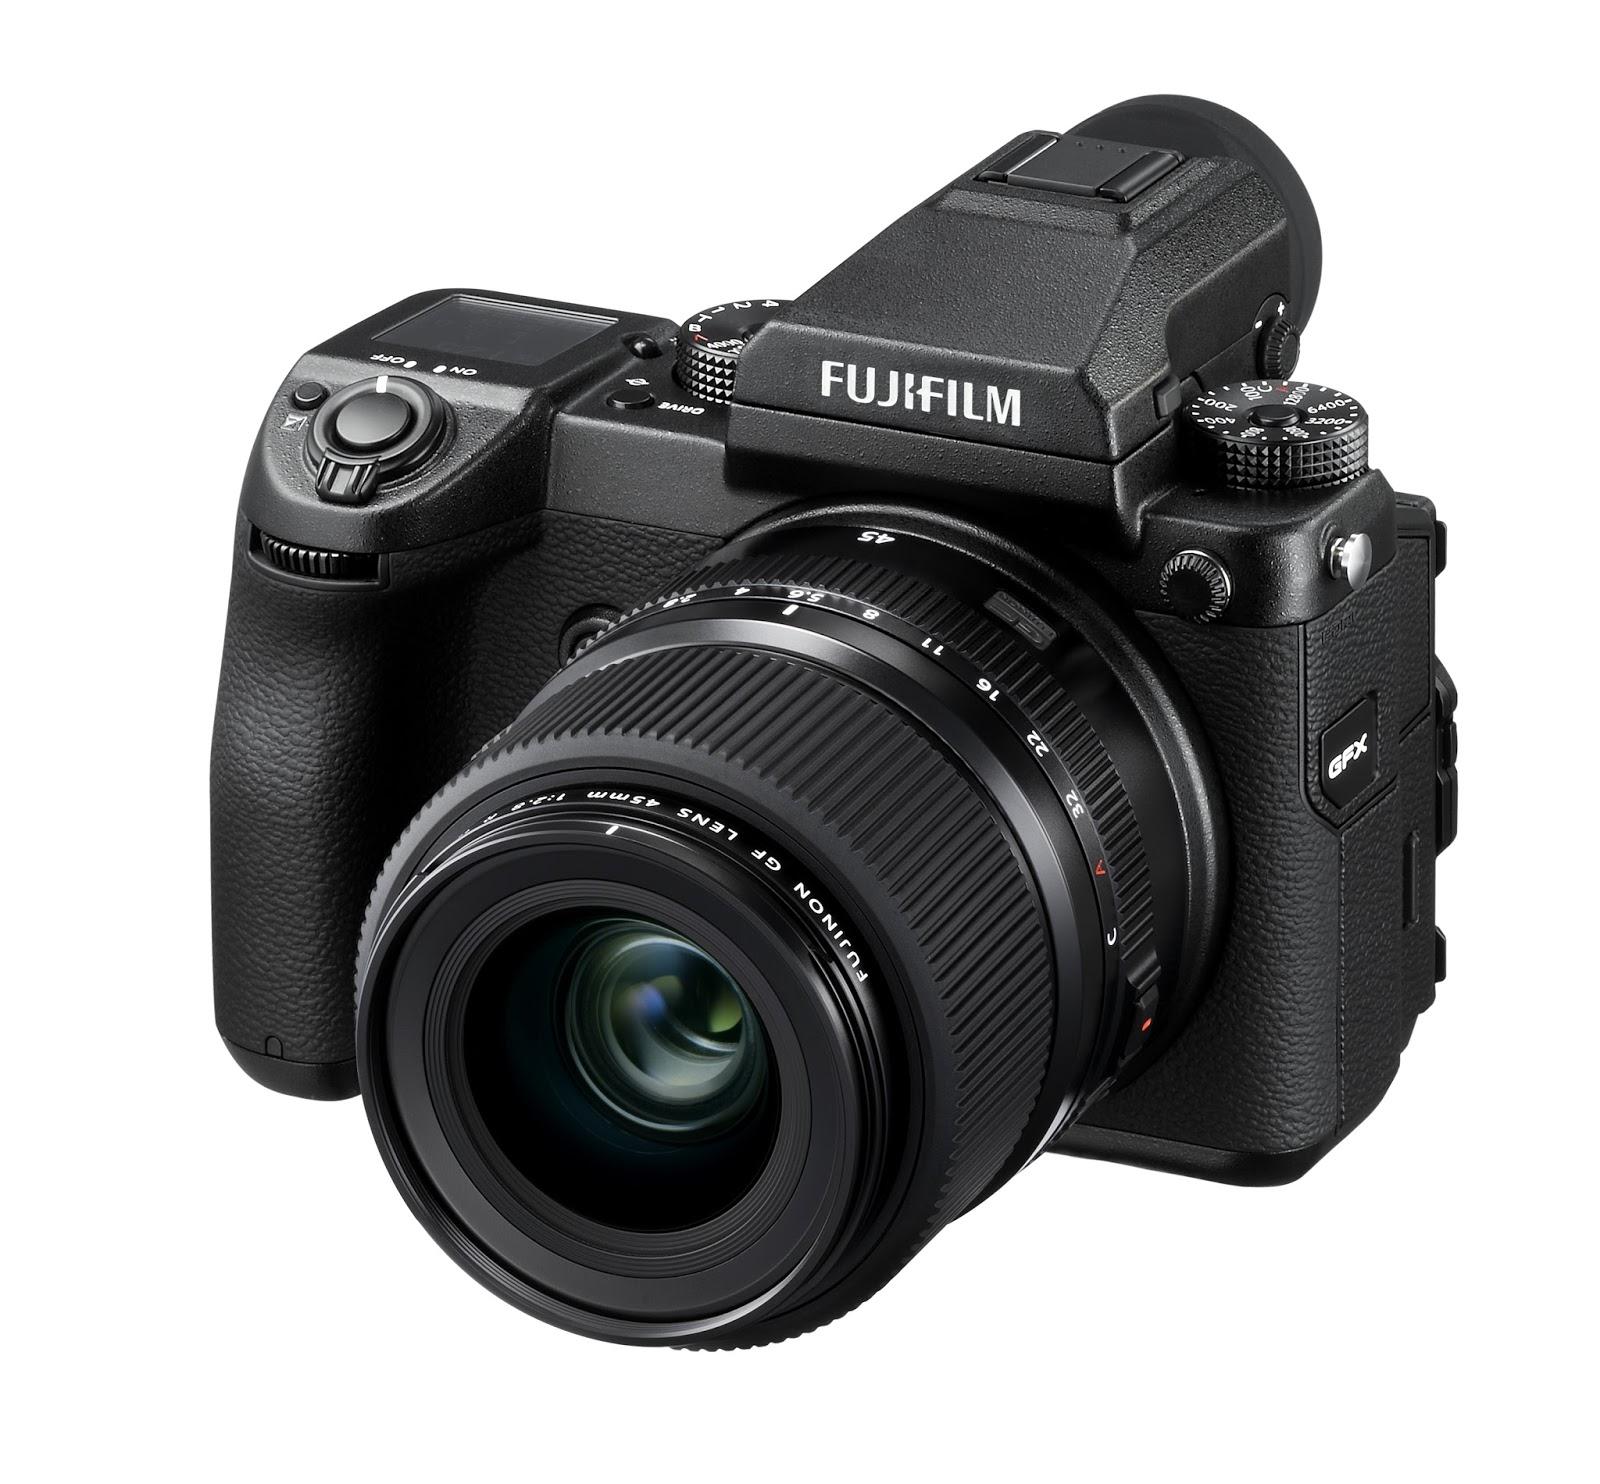 Камера Fujifilm GFX 50s и объектив Fujinon GF 45mm f/2.8 R WR